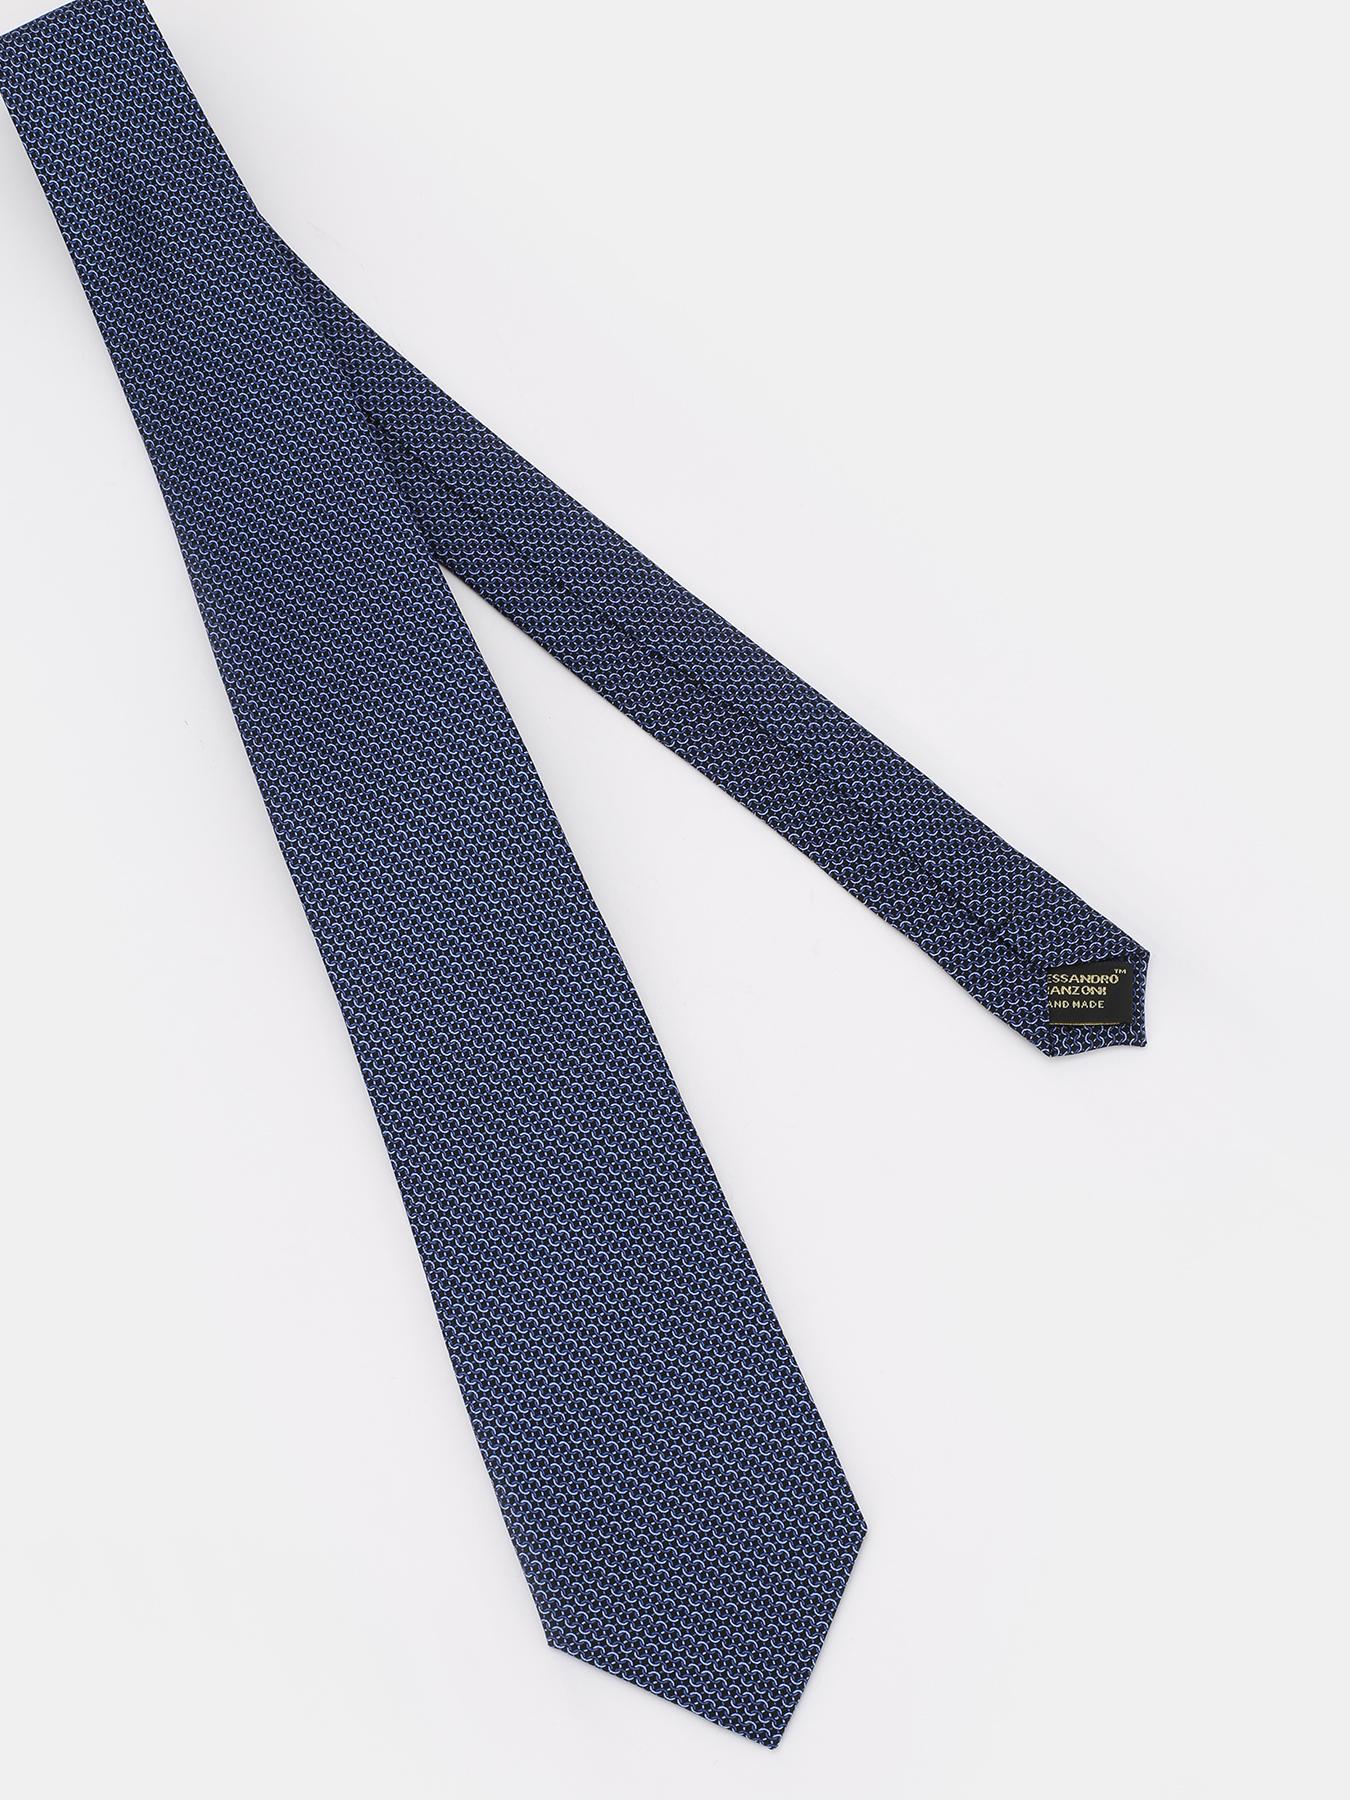 Alessandro Manzoni Шелковый галстук 312356-185 Фото 3